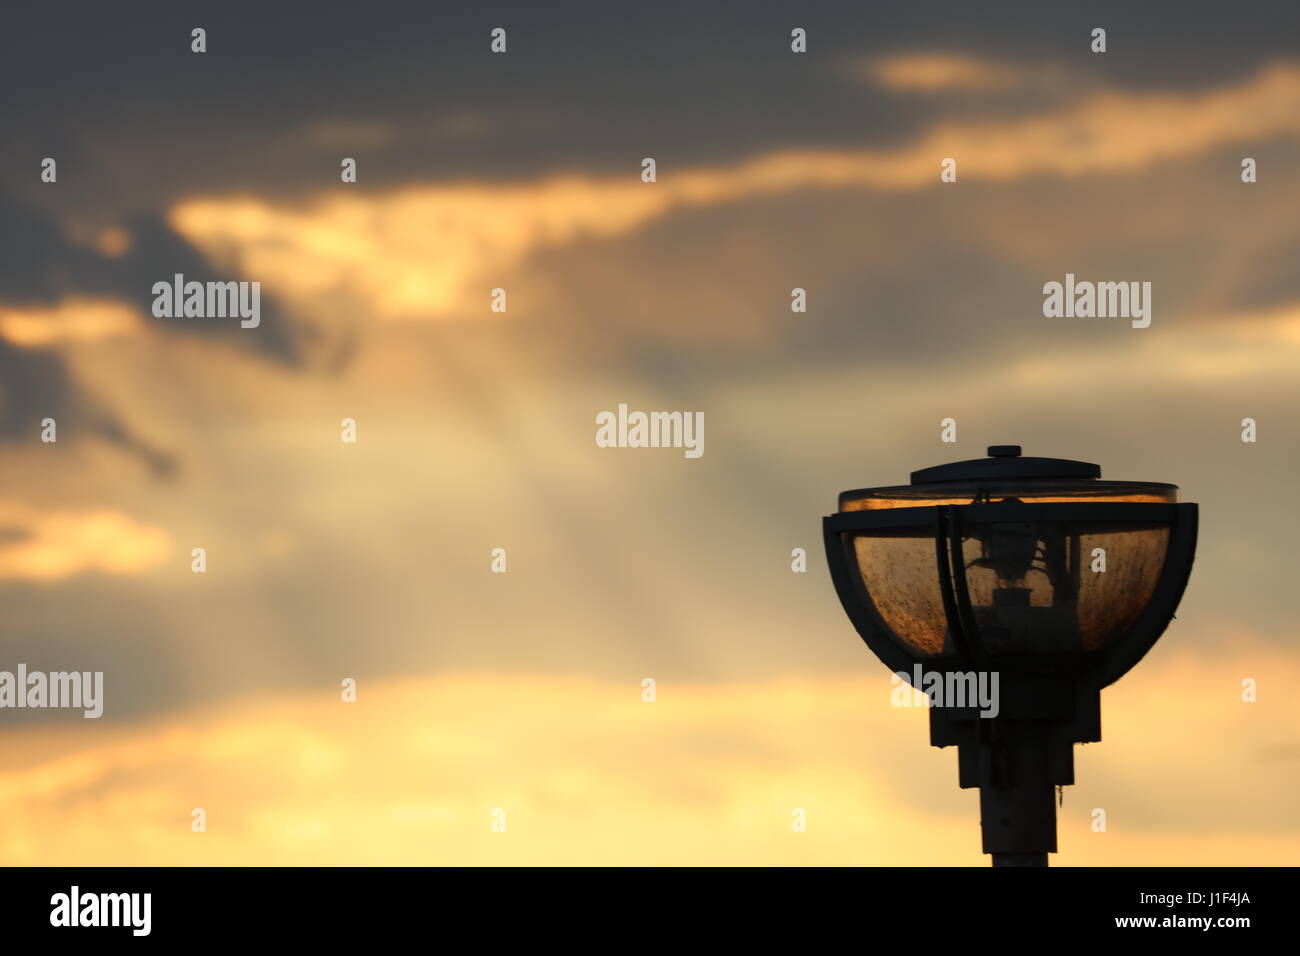 Straßenlaterne im Sonnenuntergang - Stock Image